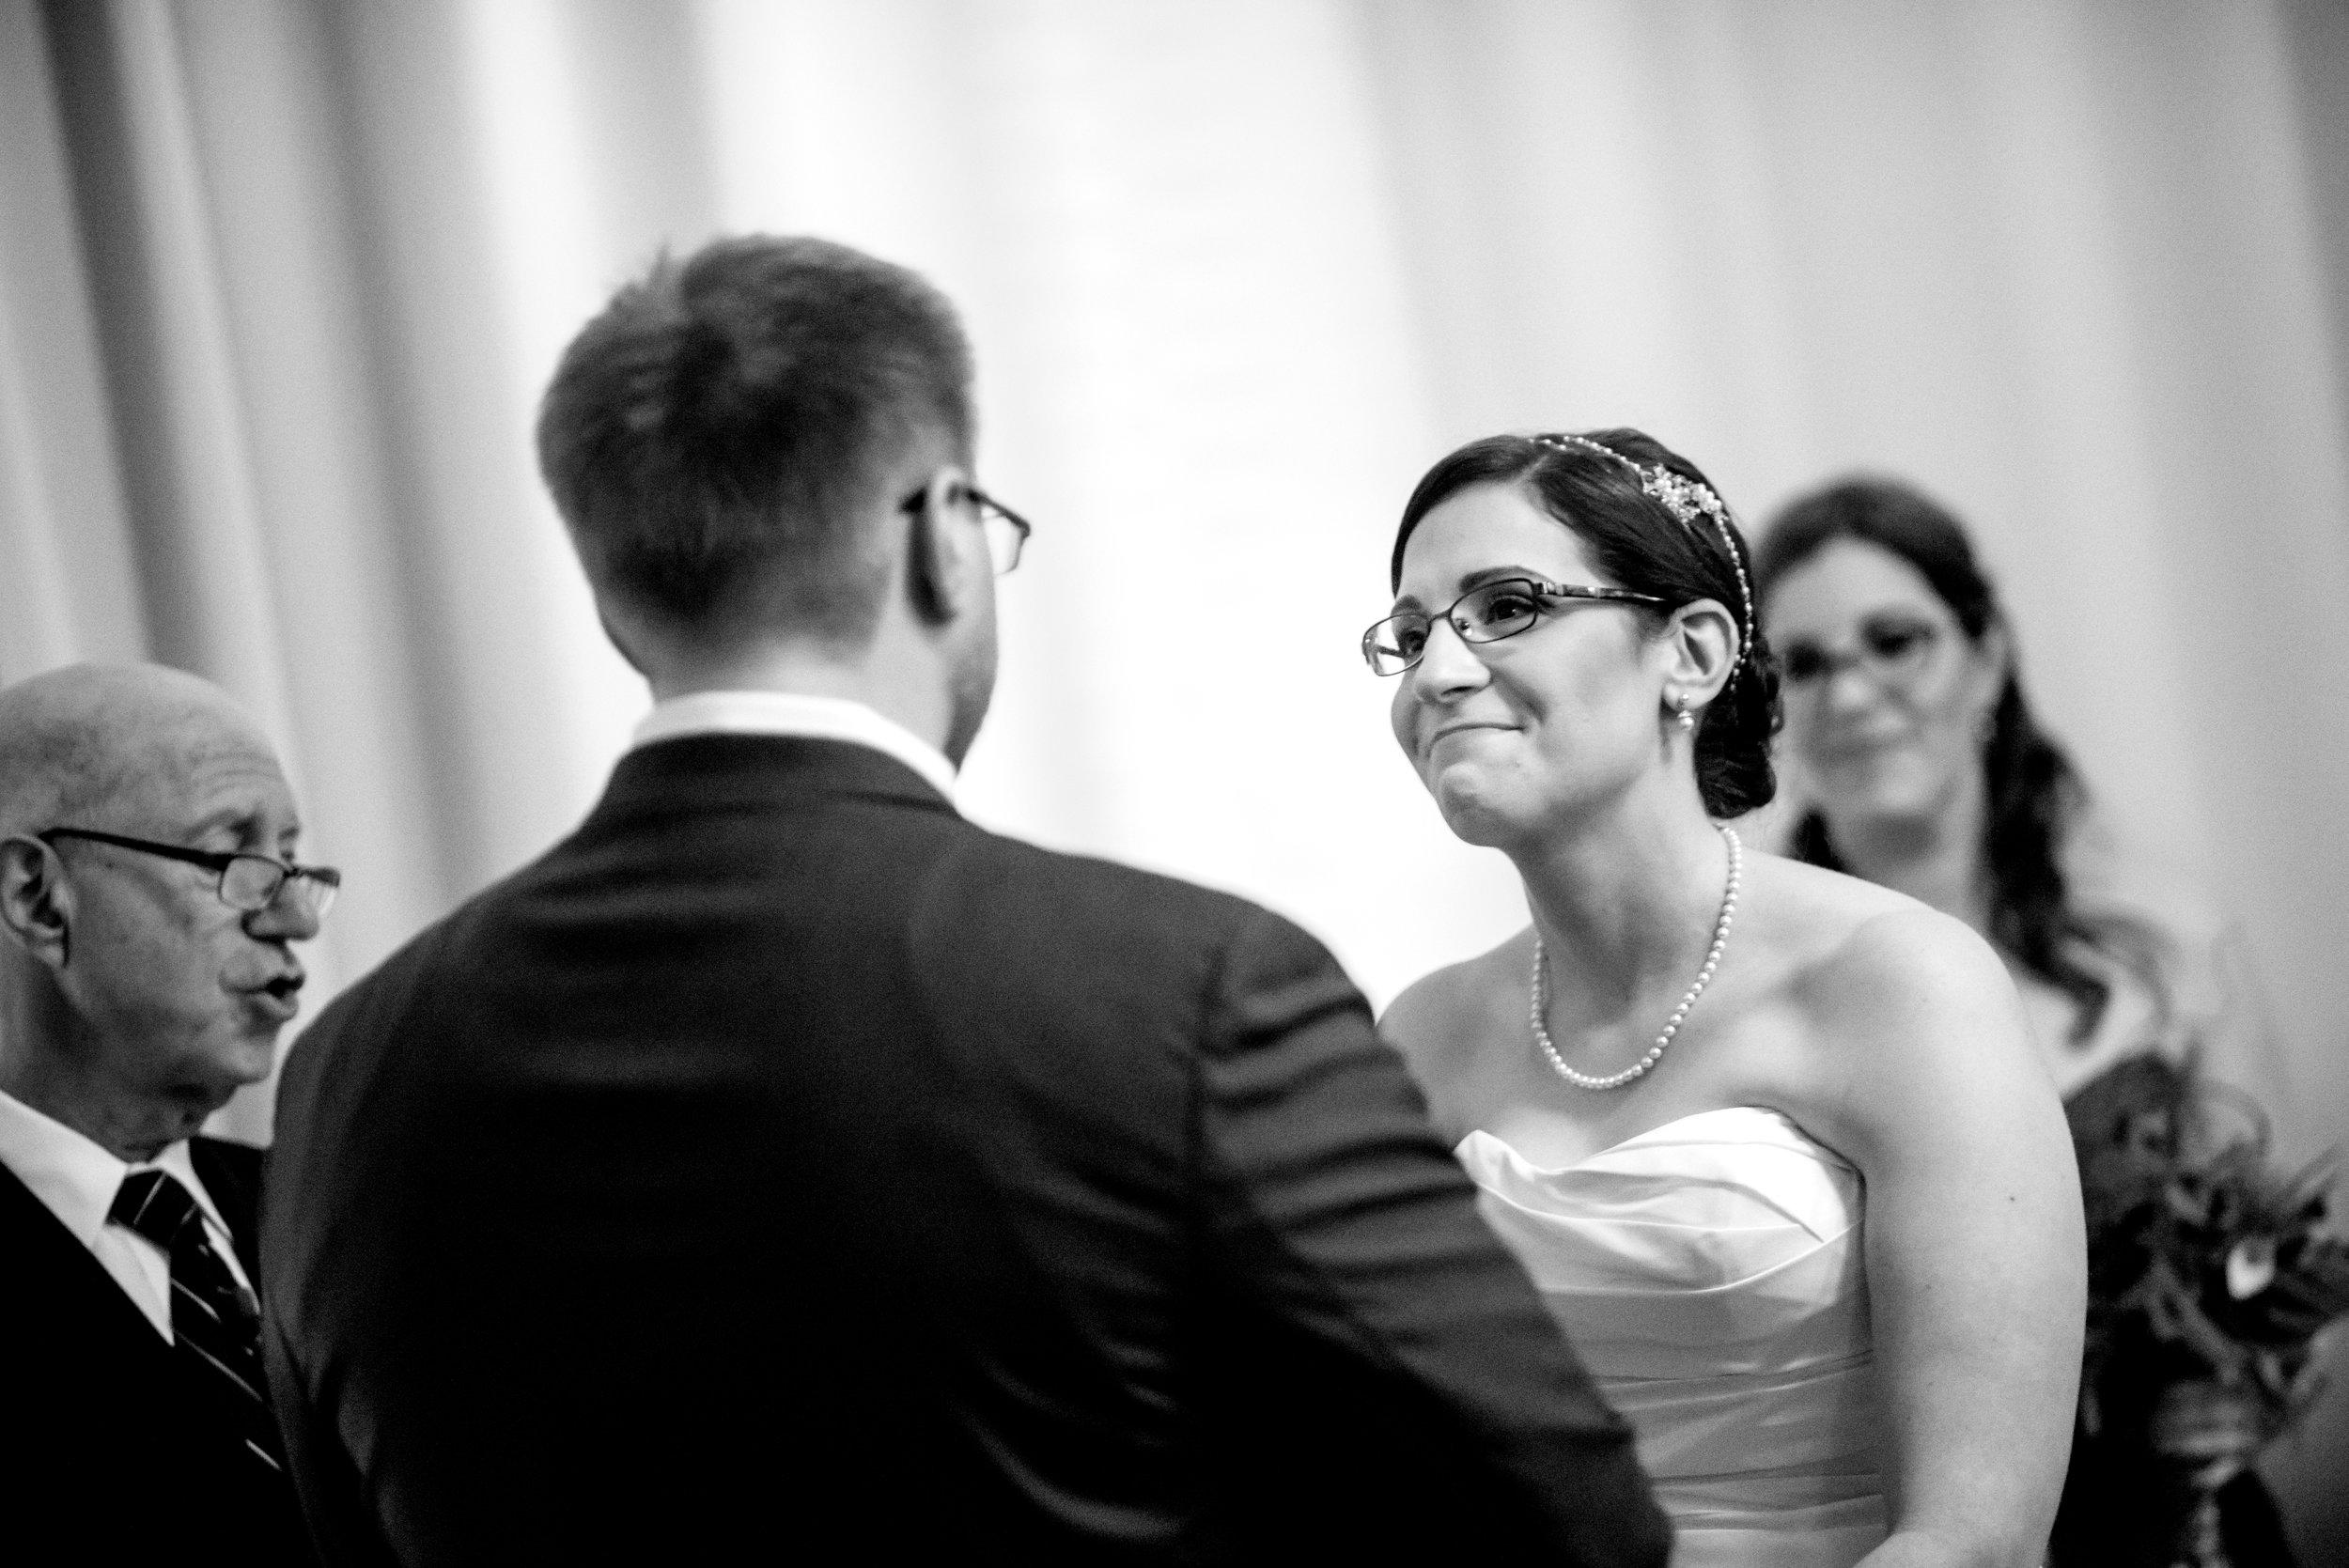 judith-john-022-citizen-hotel-sacramento-wedding-photographer-katherine-nicole-photography.JPG